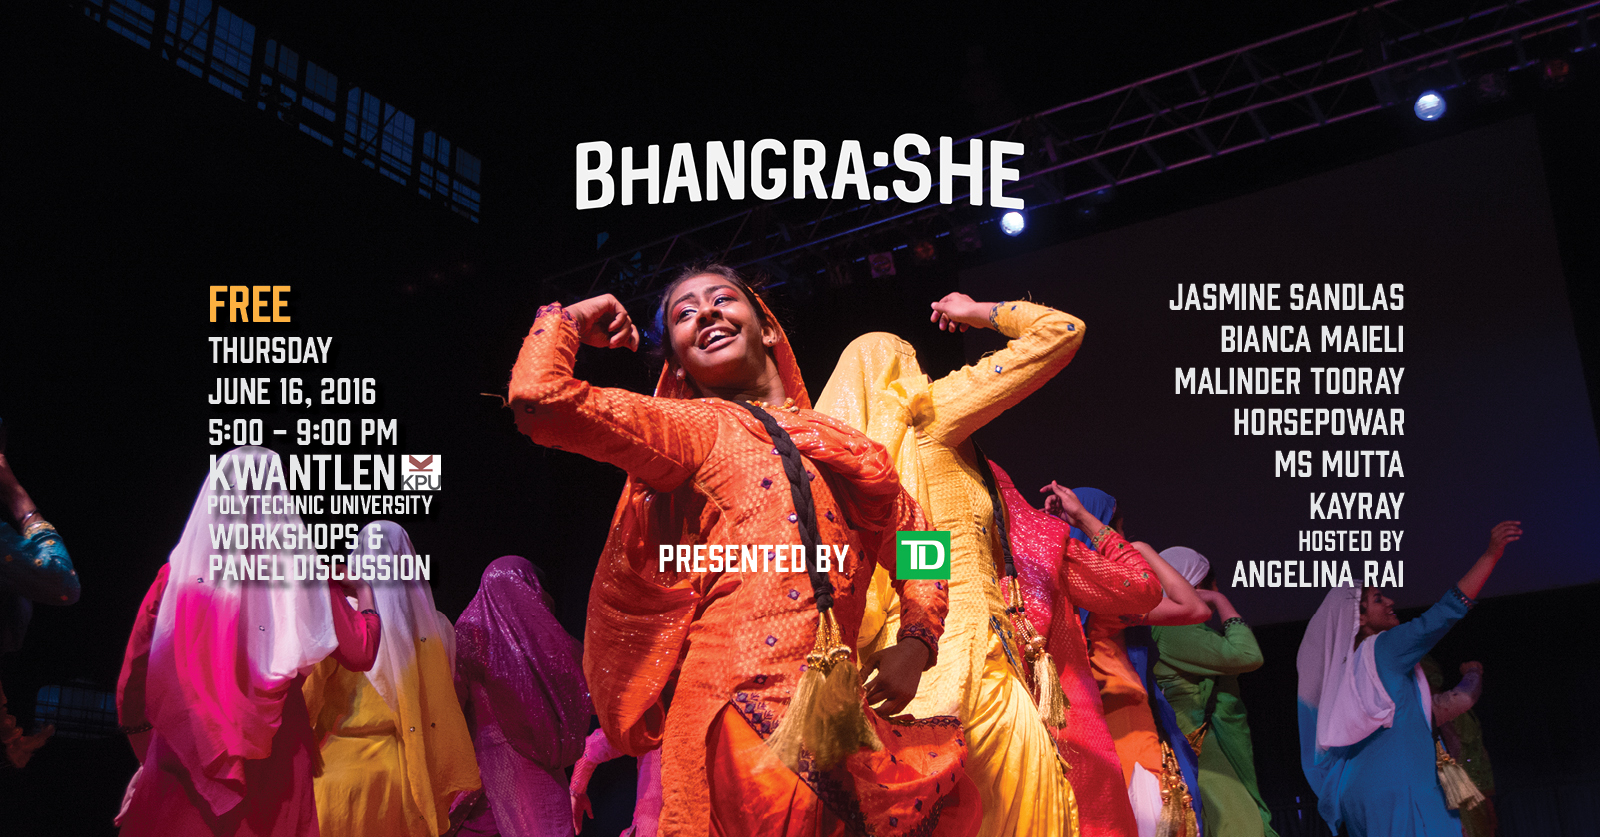 bhangra-she_fb_(2).jpg